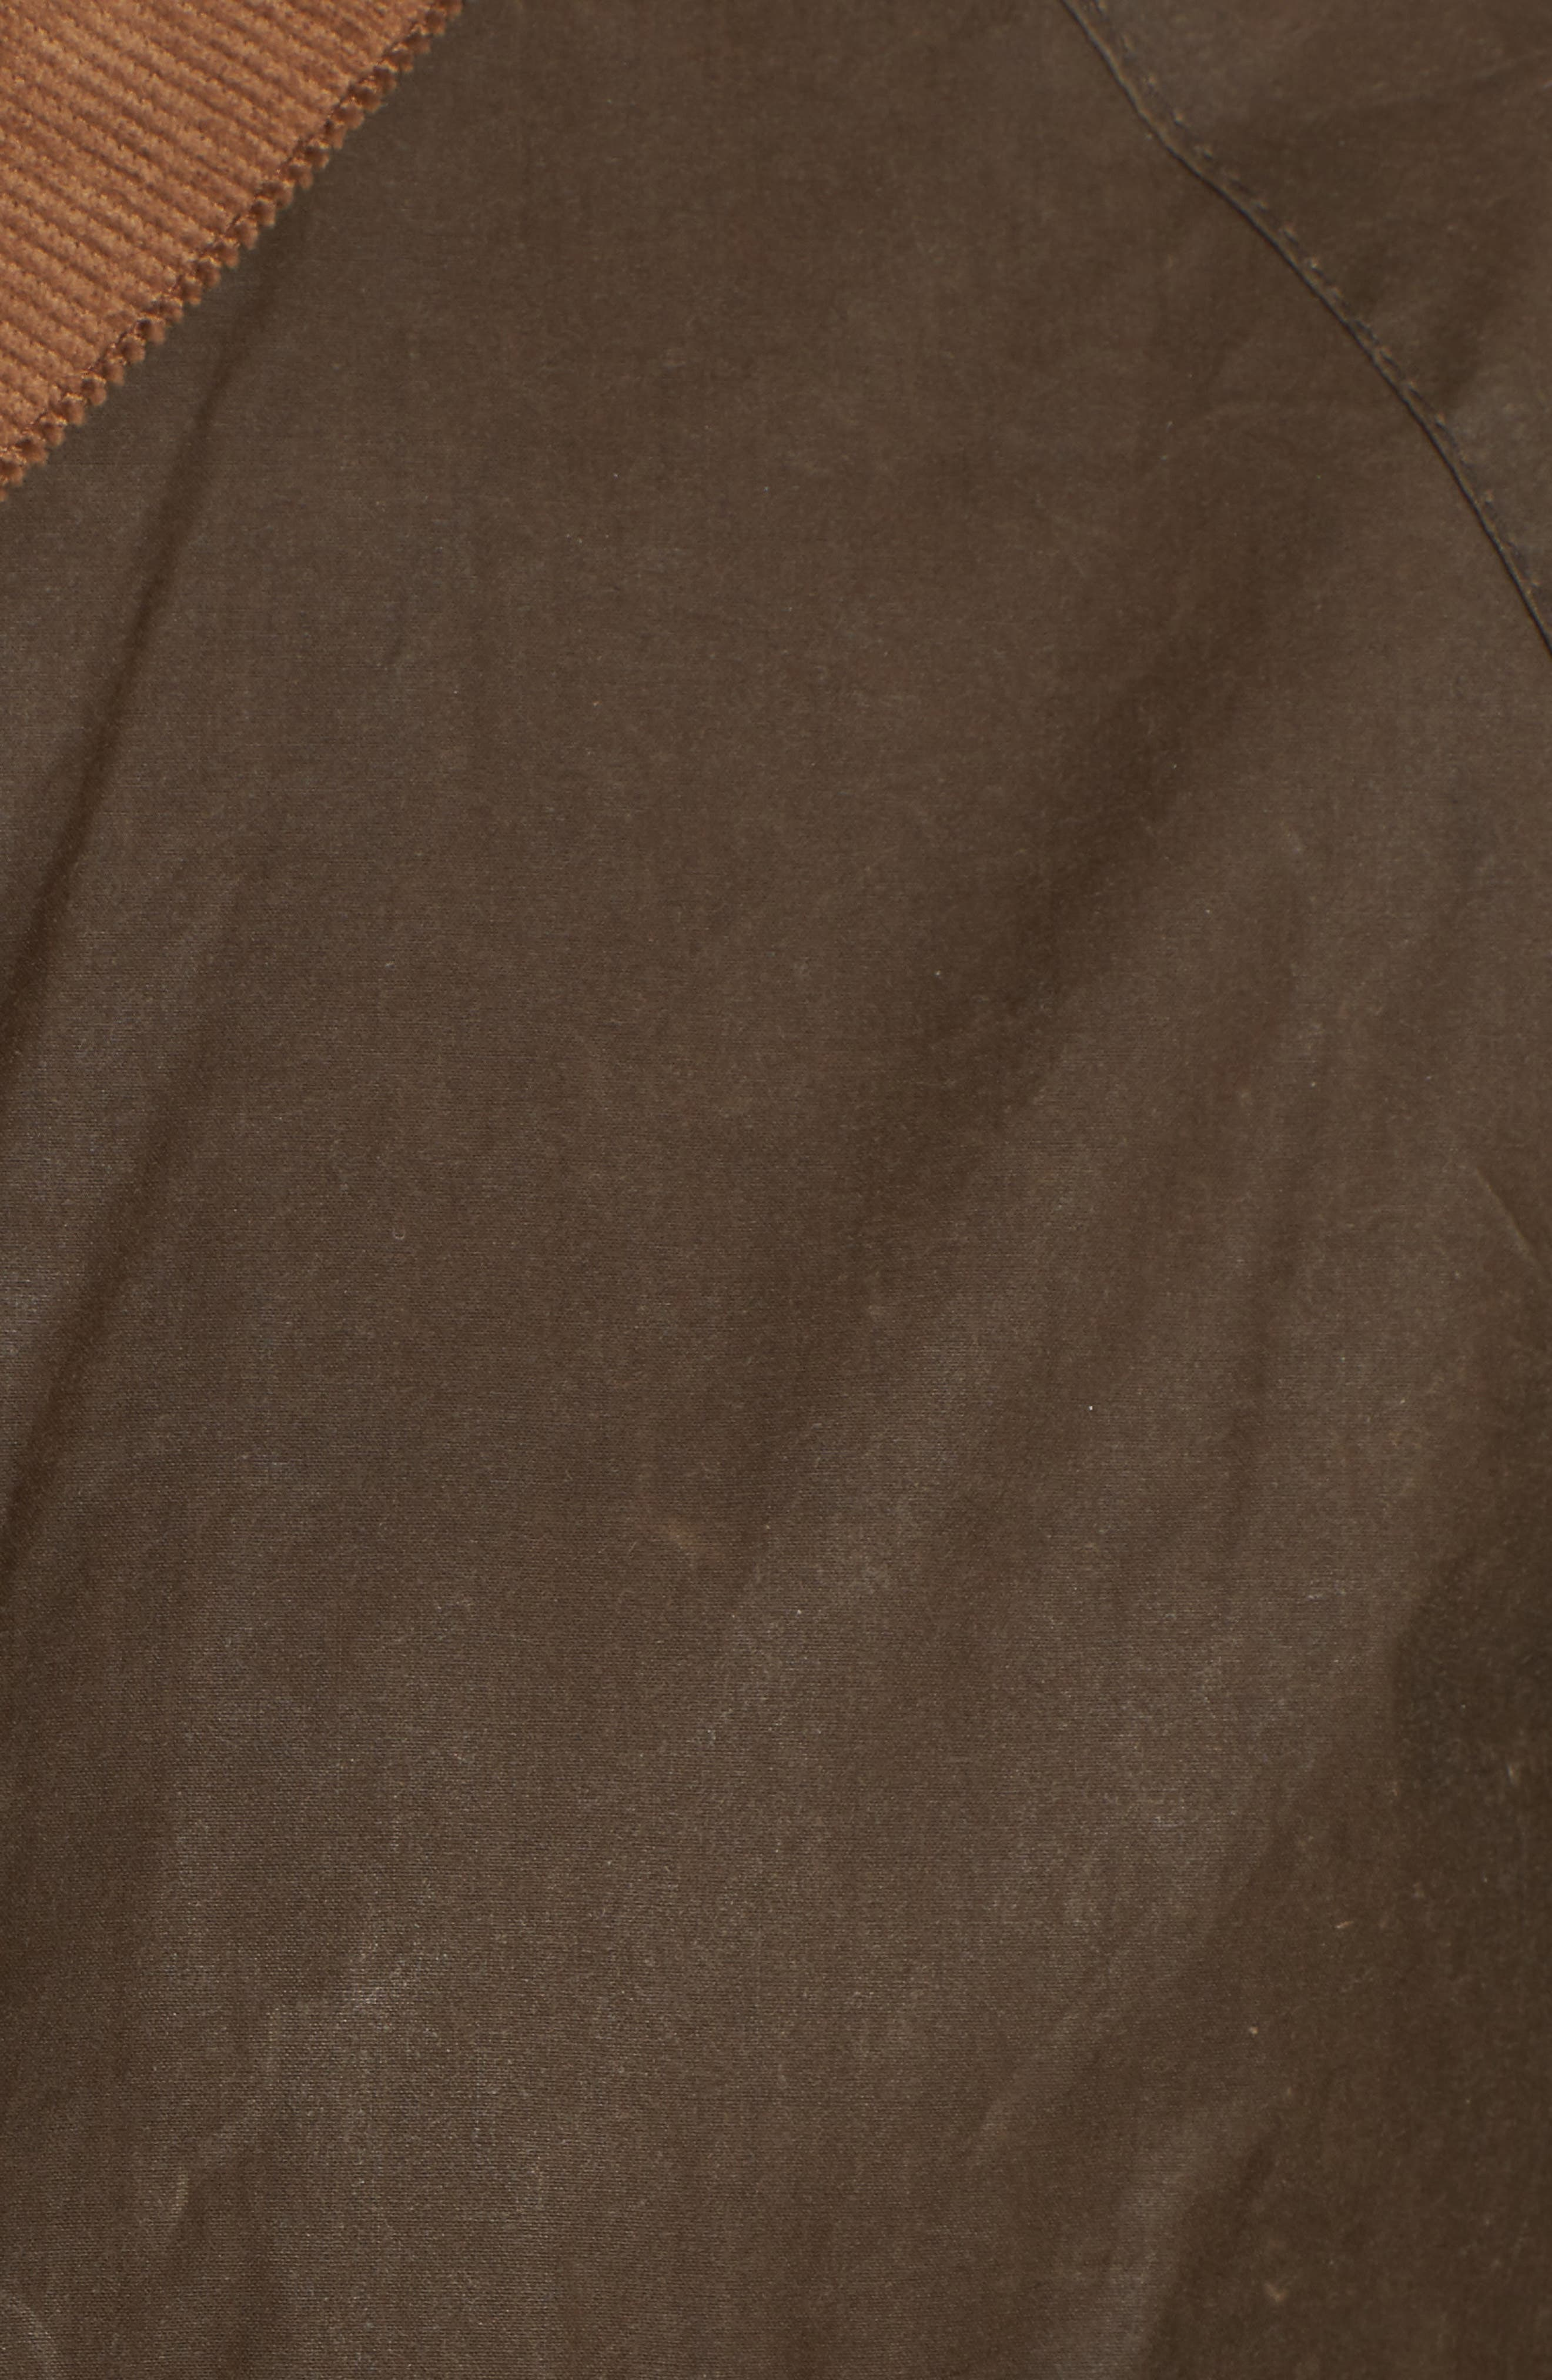 Acorn Water Resistant Waxed Cotton Jacket,                             Alternate thumbnail 7, color,                             230